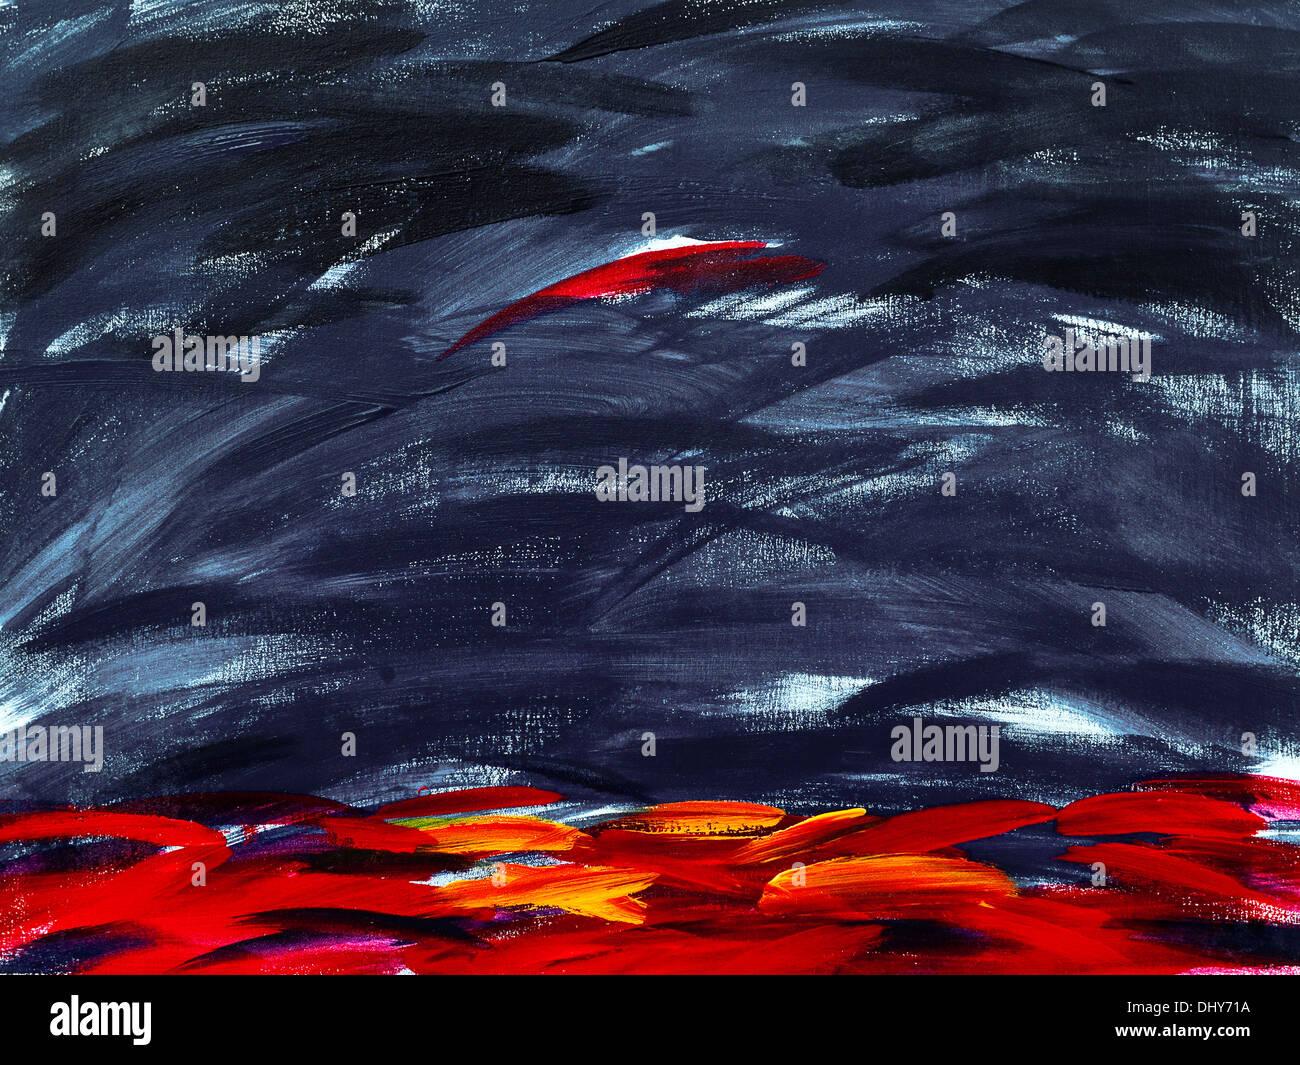 Modern abstract acrylic painting on canvas, by Ed Buziak. Stock Photo